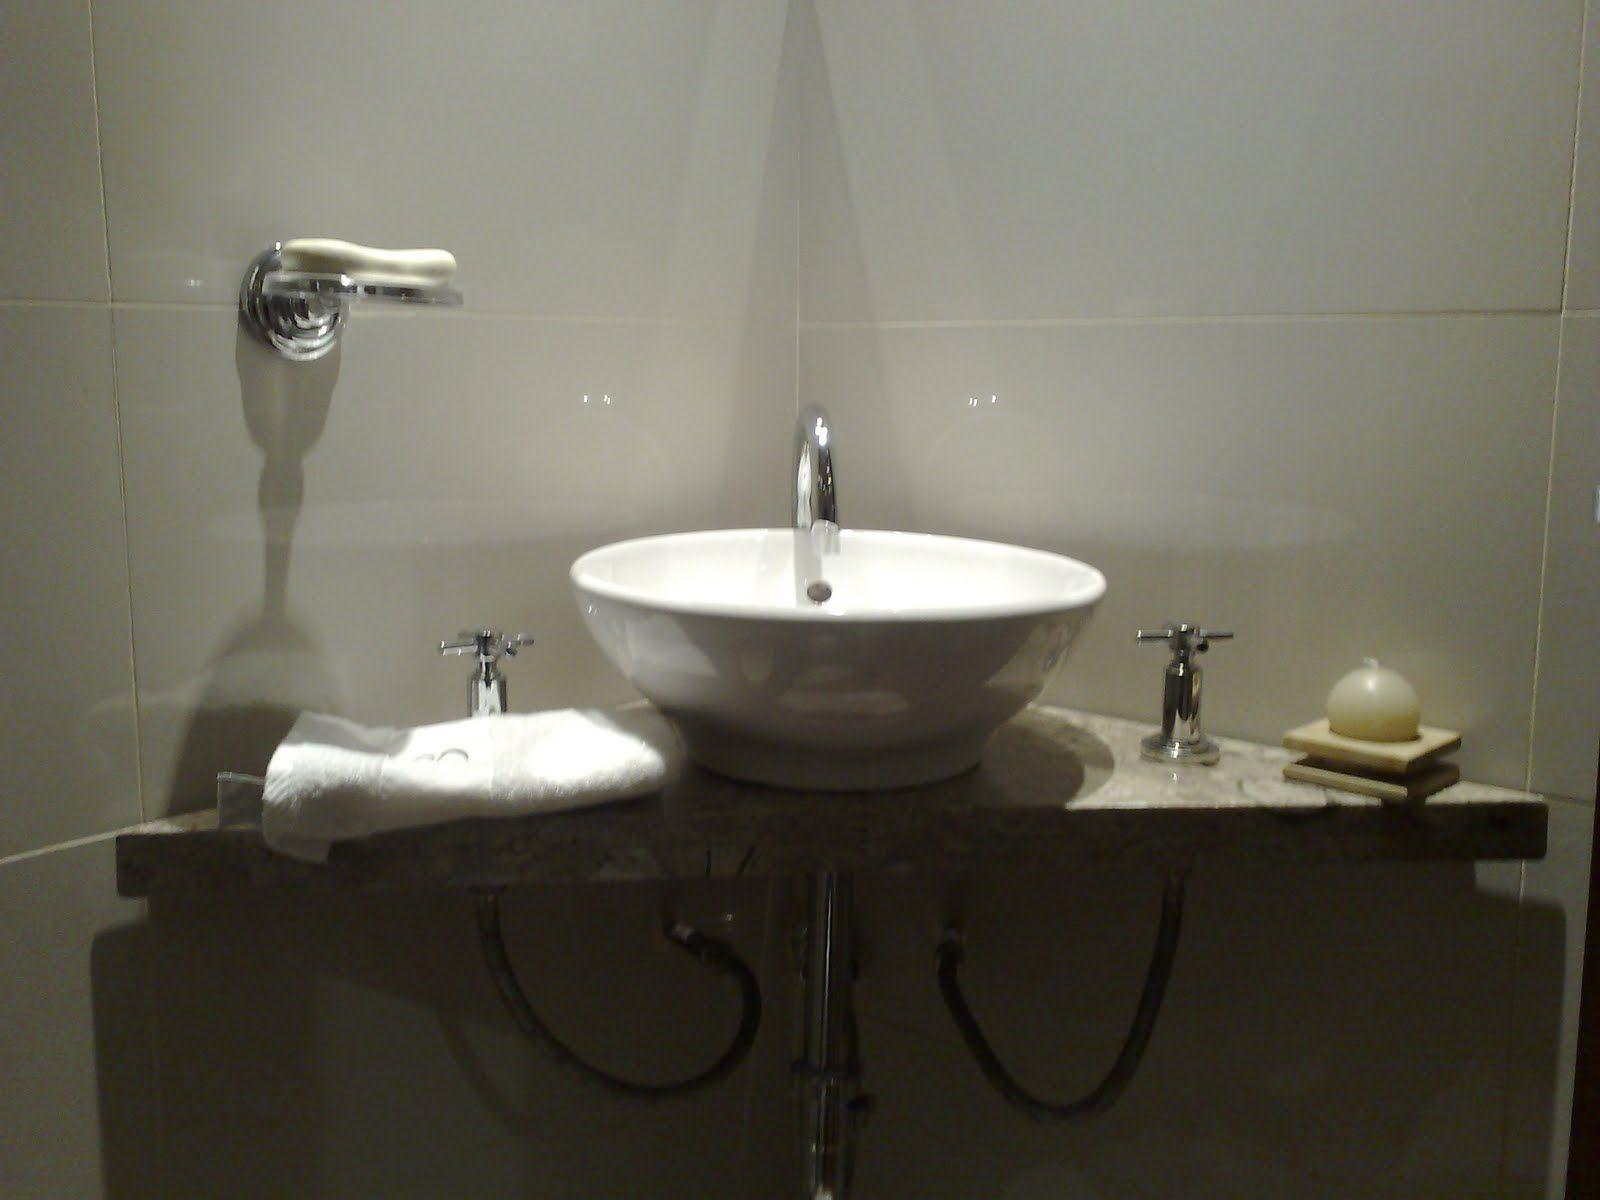 lavamanos esquinero - Buscar con Google | Lavabo esquinero